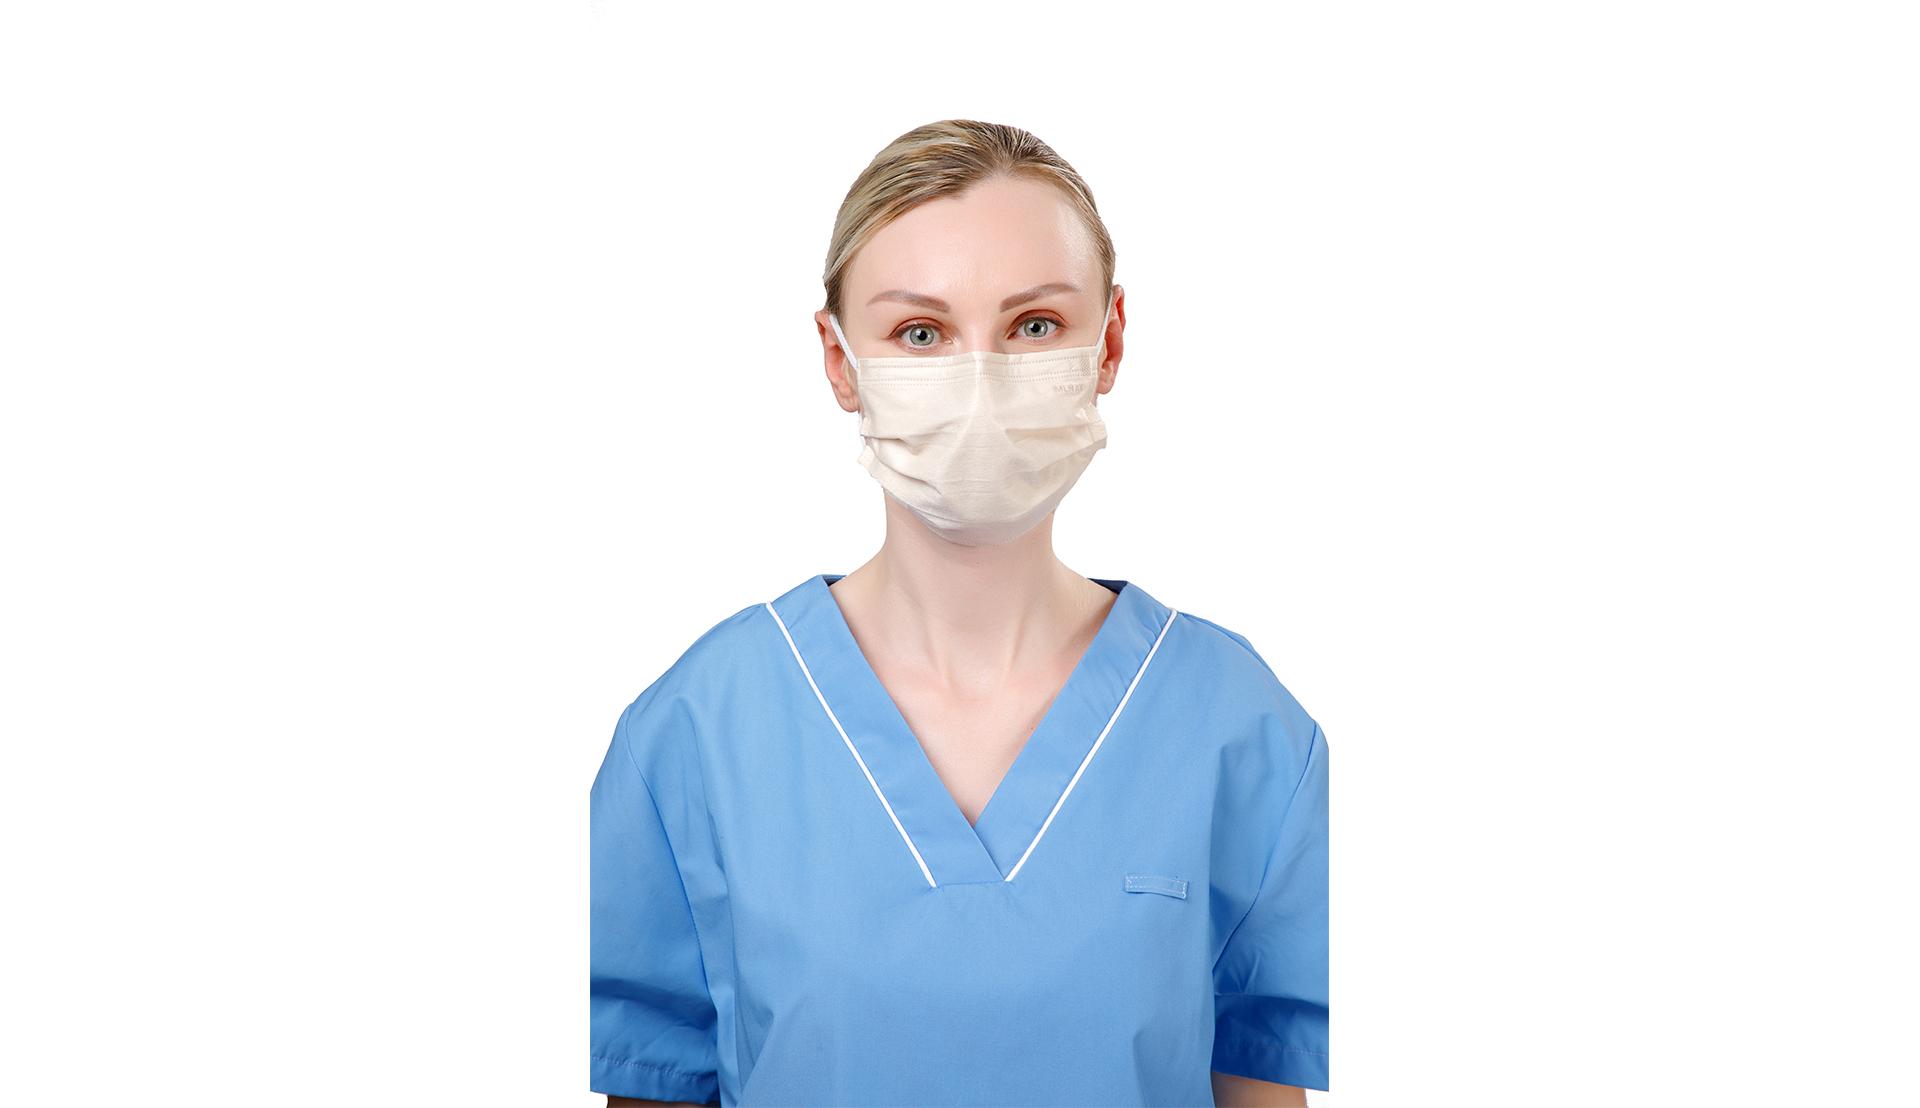 EN14683 TYPE IIR Surgical Mask with Ear Loops